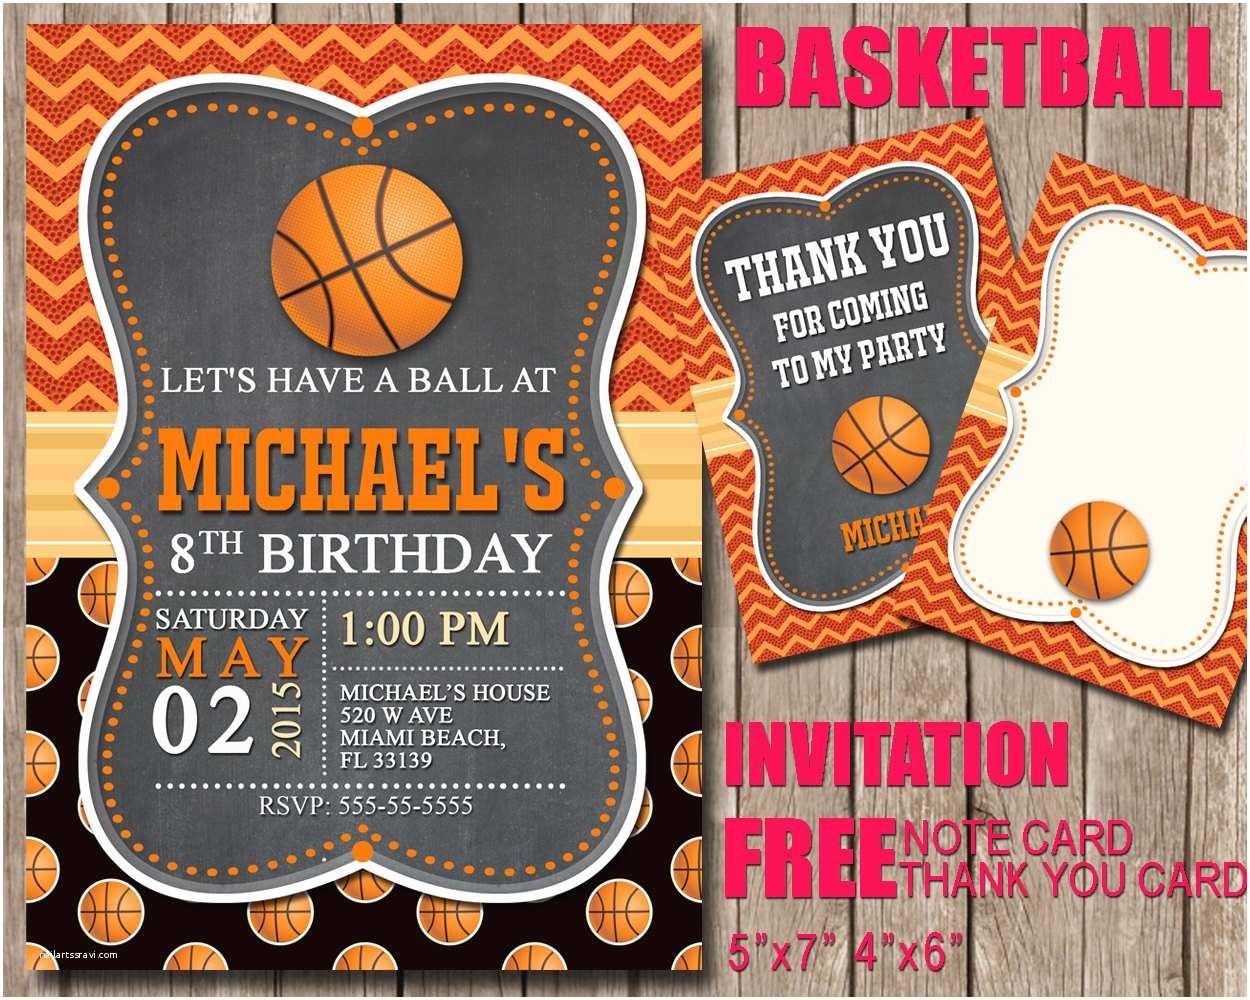 Basketball Birthday Invitations Basketball Invitation for Sport Birthday Party Sport